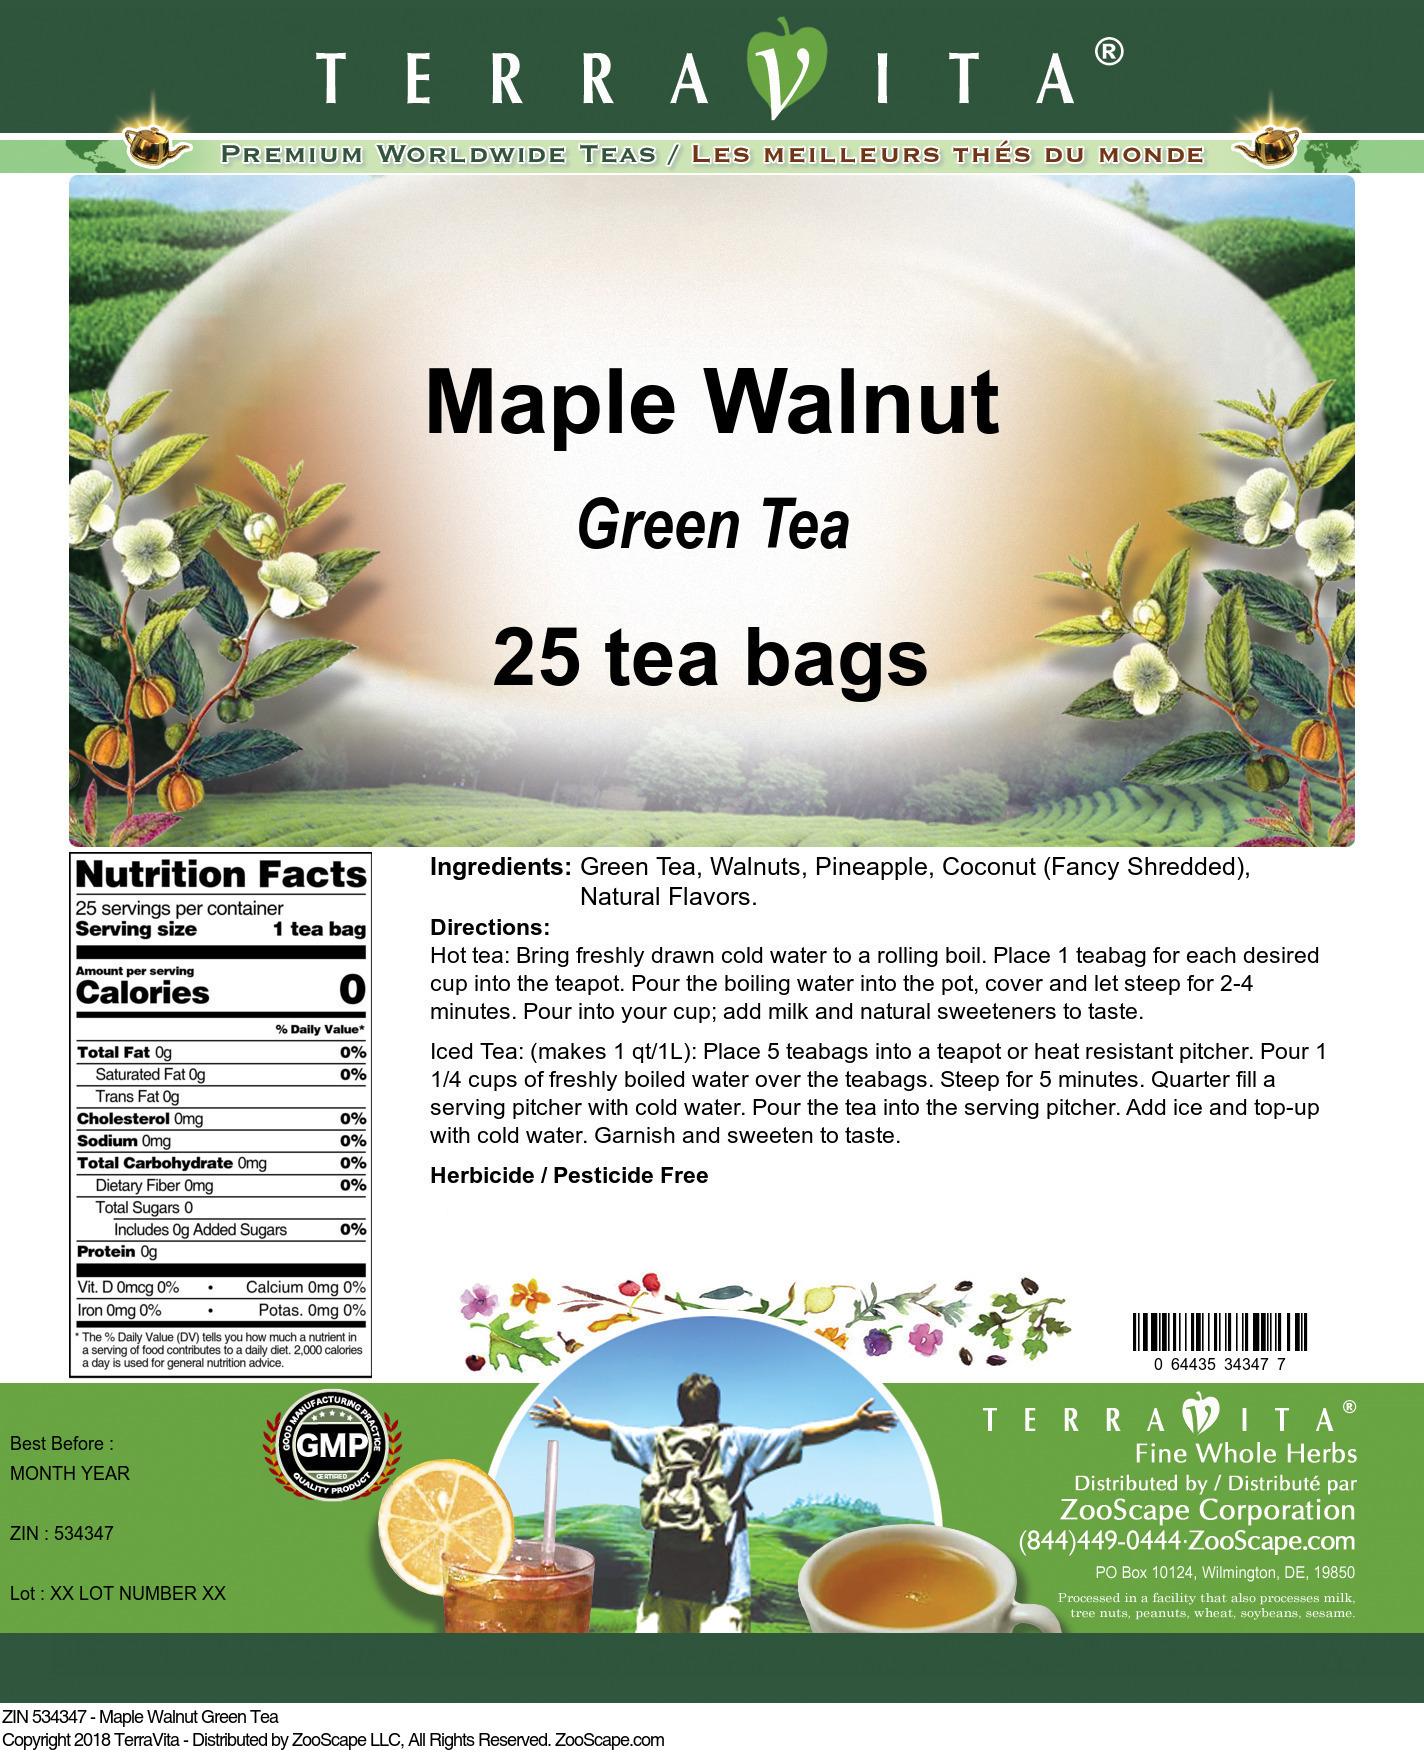 Maple Walnut Green Tea